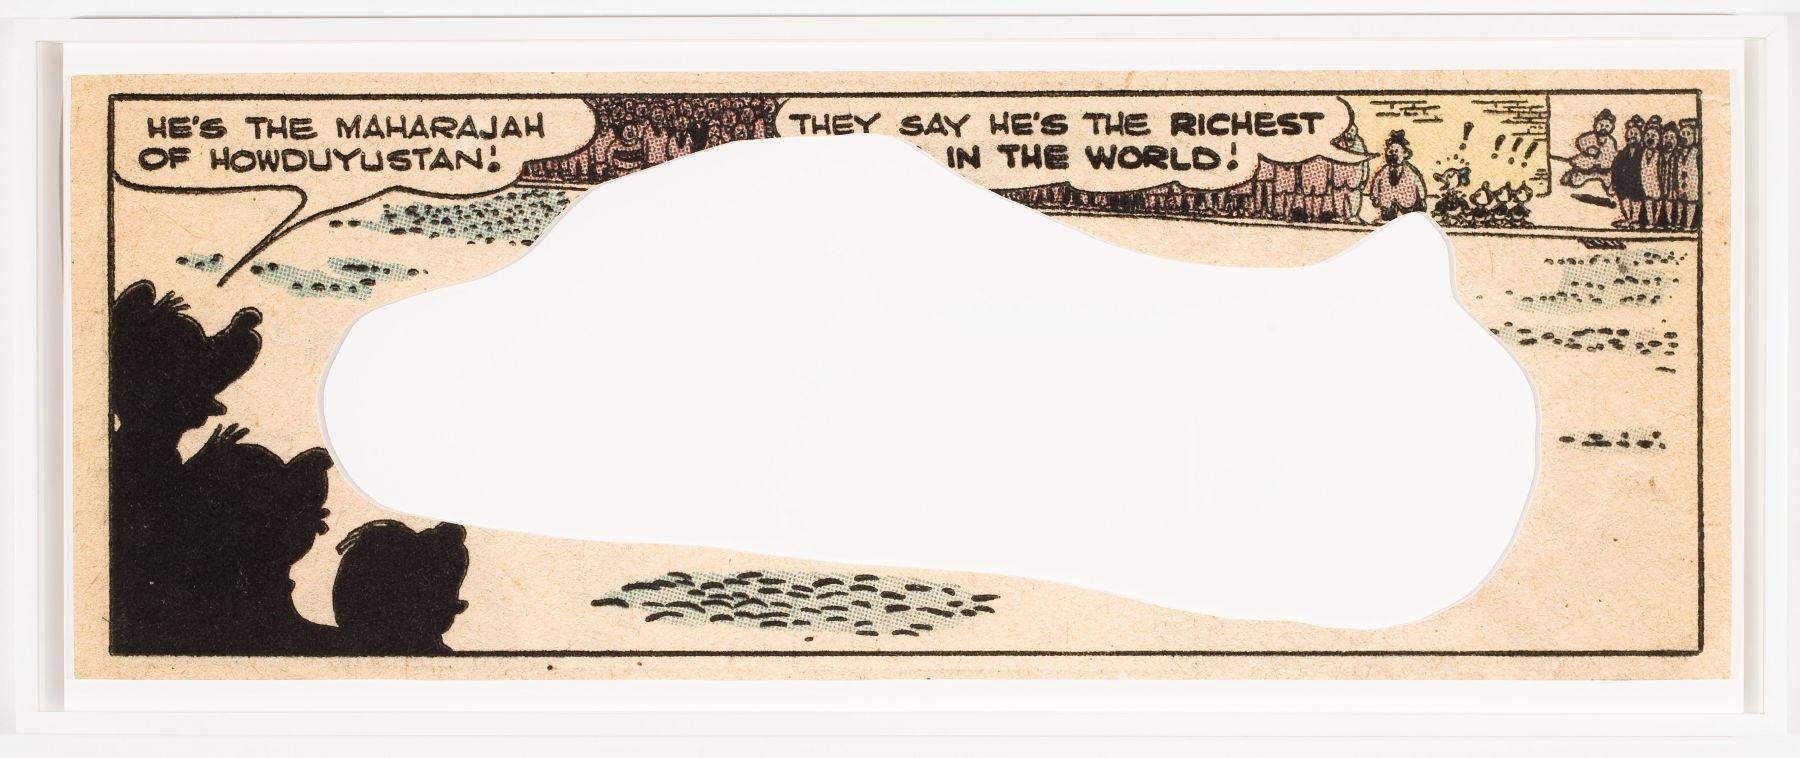 Allen Ruppersberg, Little Problem 1, 2010, archival inkjet print on paper, 15 x 42 inches